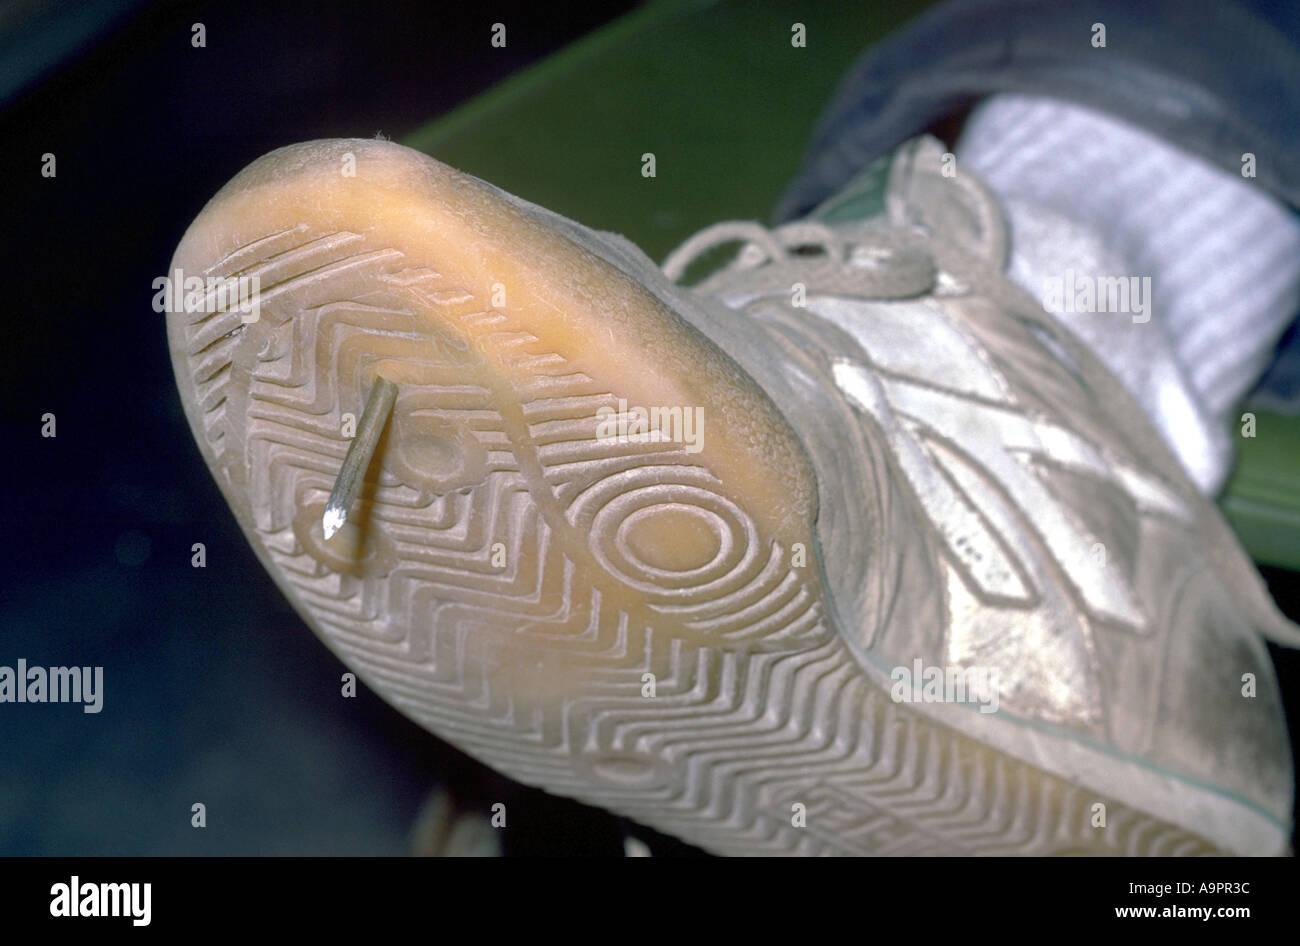 Nail penetrating Injury to foot Stock Photo: 4054843 - Alamy